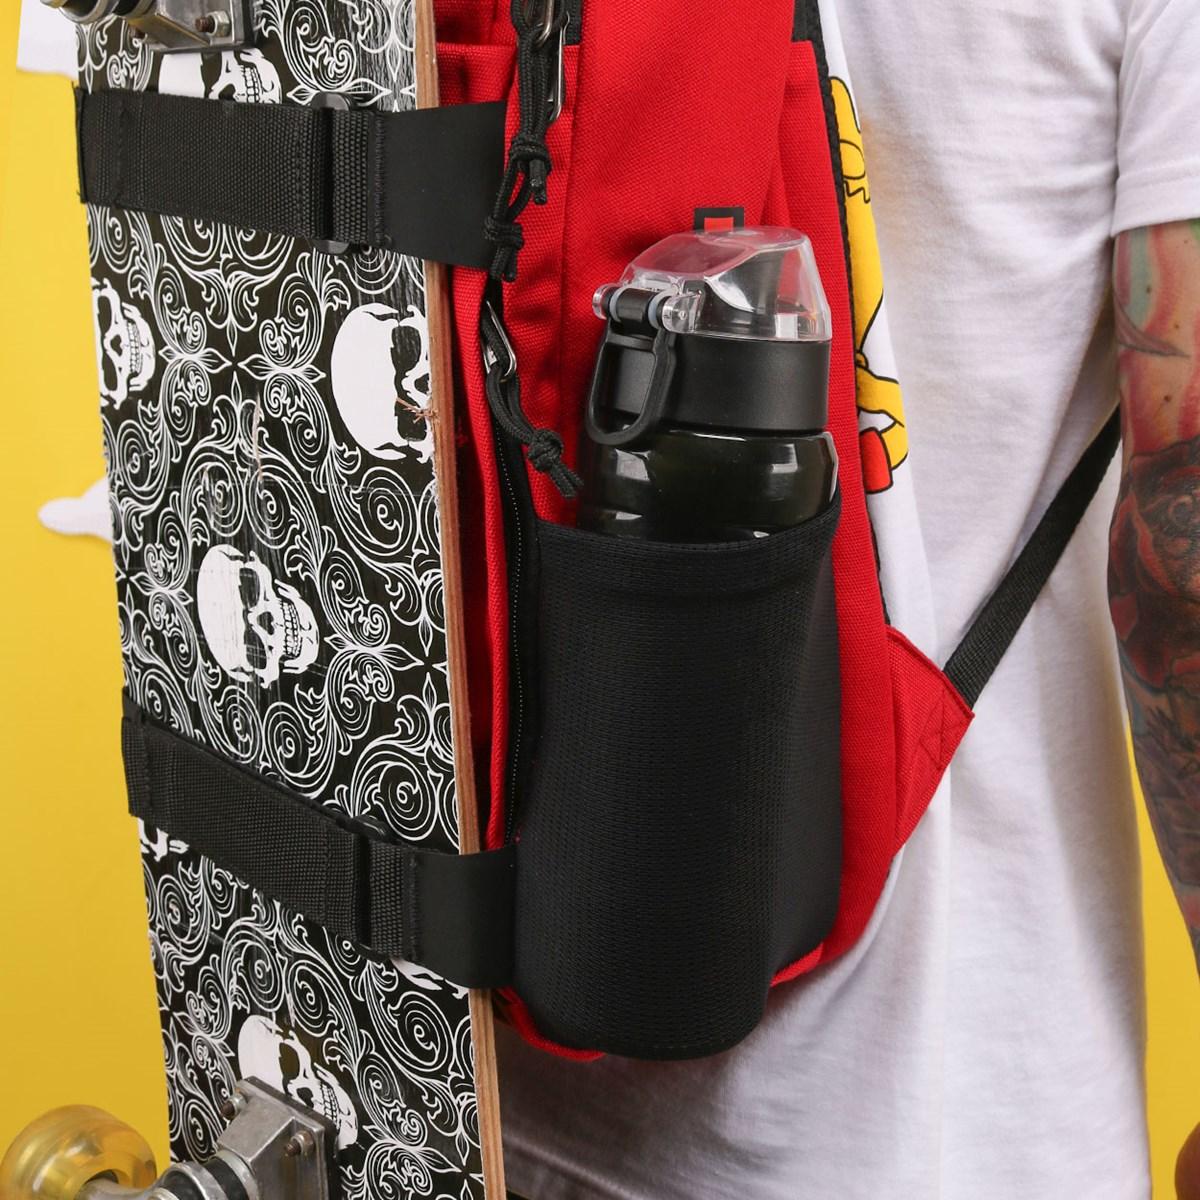 Mochila Vans The Simpsons El Barto Obstacle Skatepack Red VN0A3I6917A